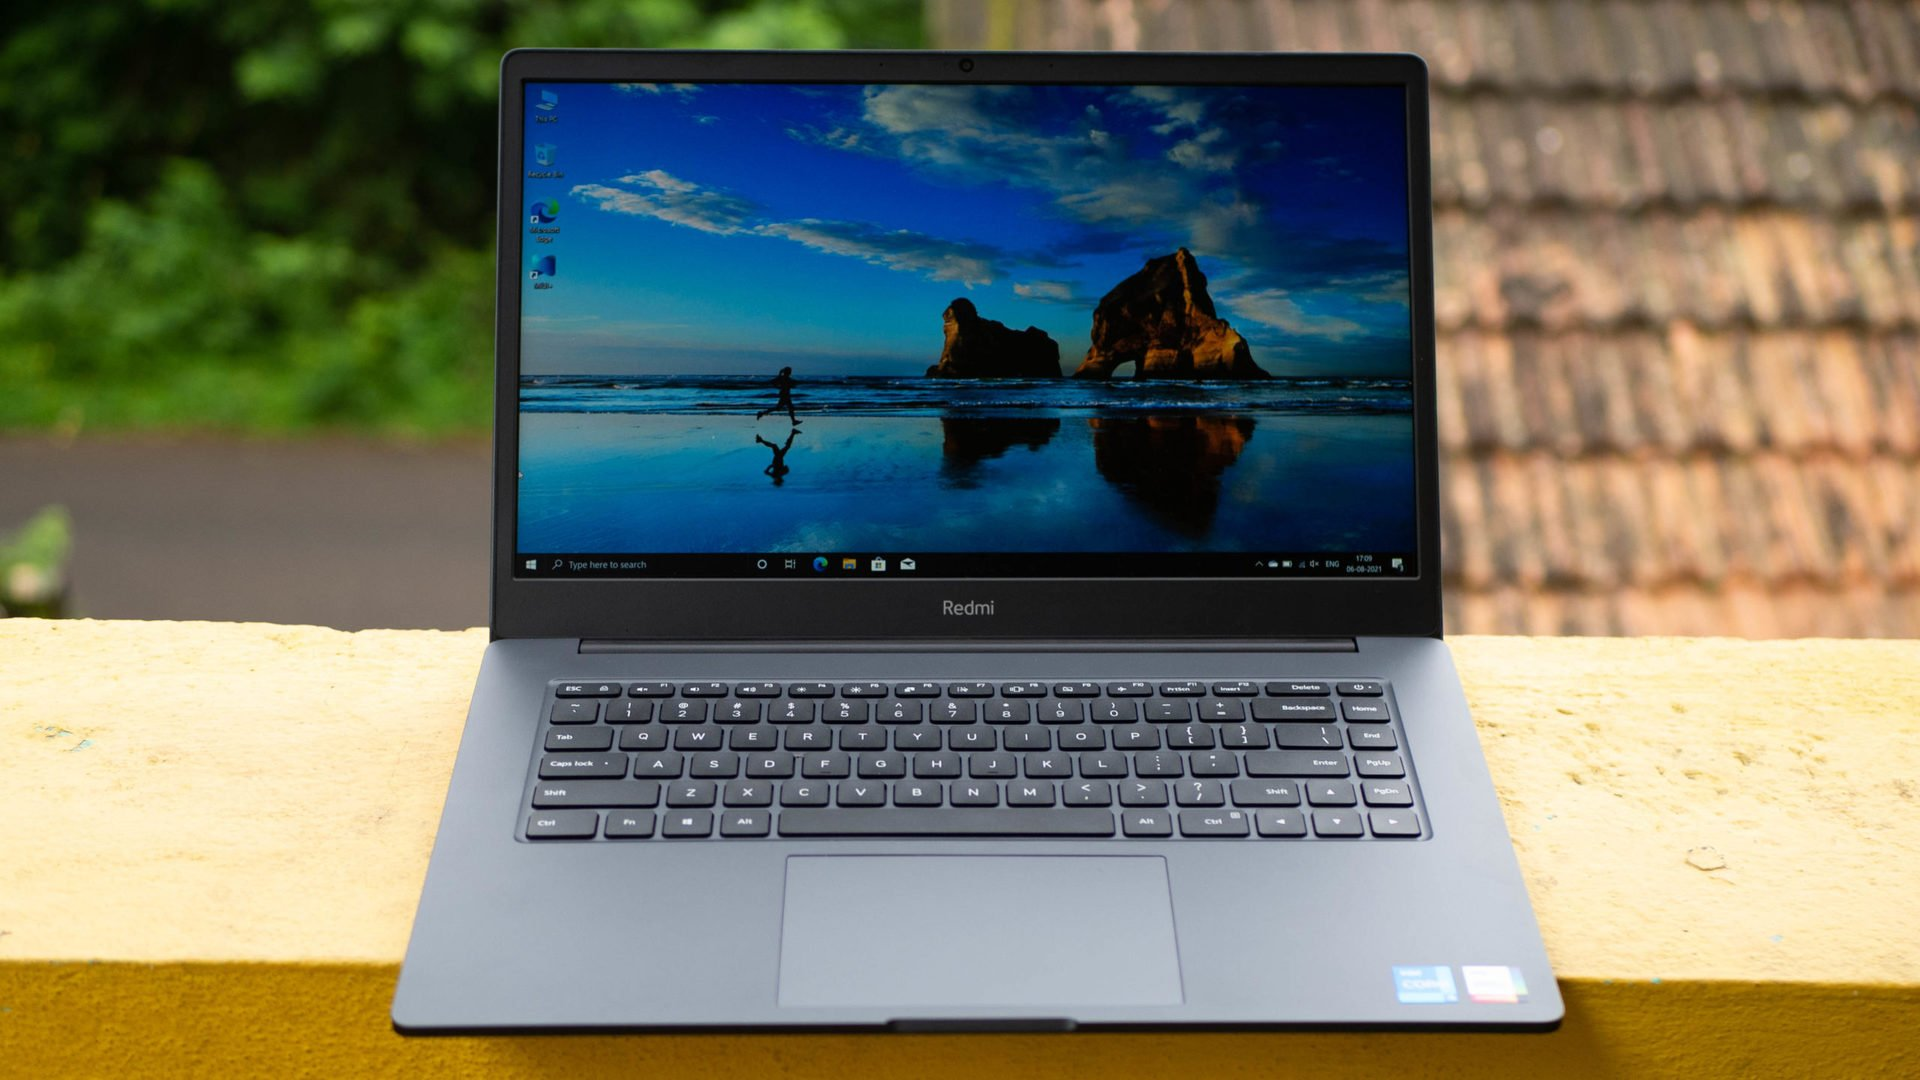 RedmiBook Pro first impression